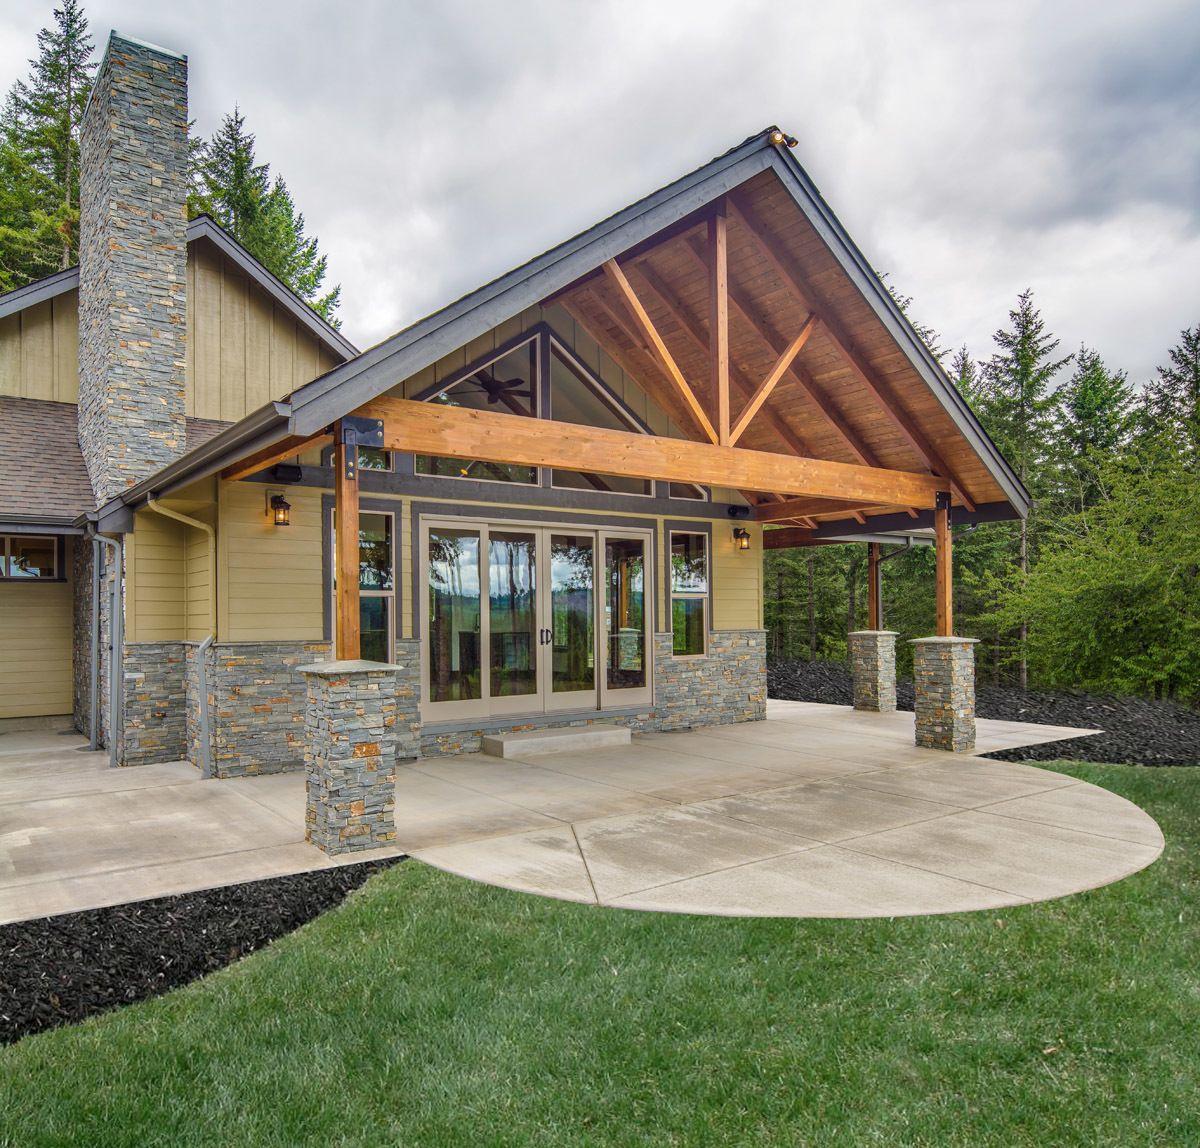 Craftsman House Plans Ranch Style: Plan 72815DA: Sticks And Struts Craftsman Ranch